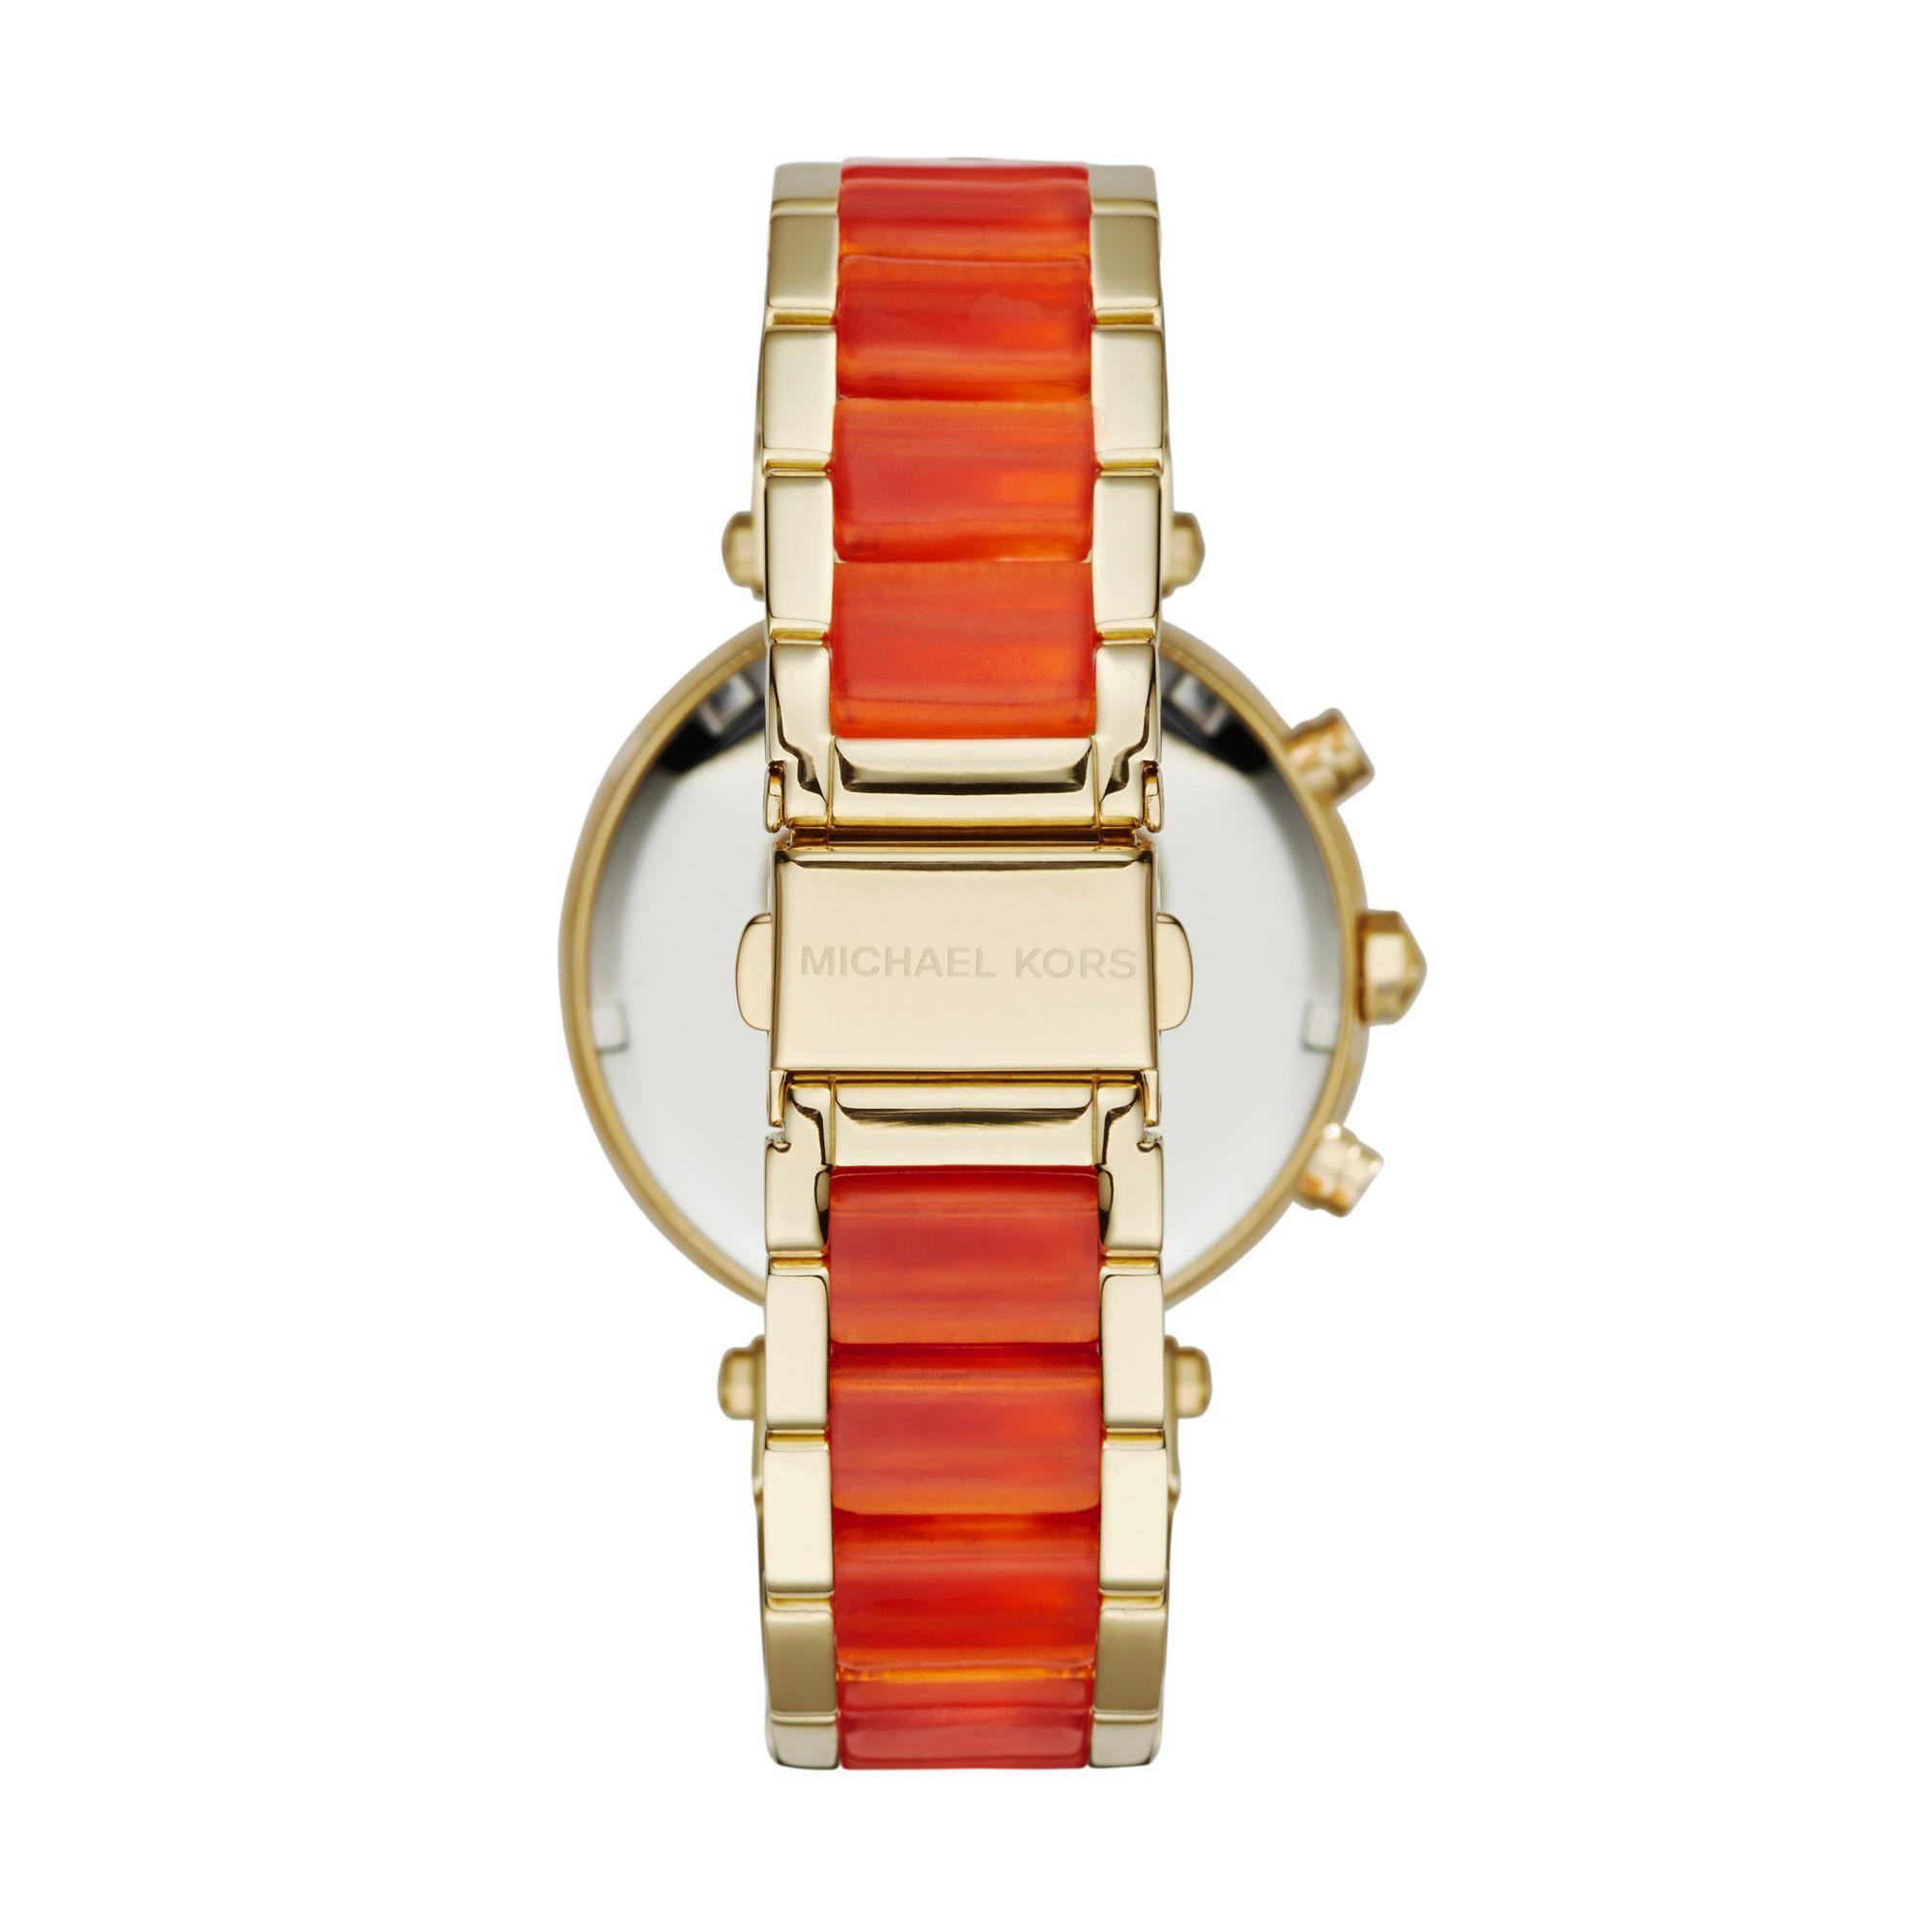 ea962409bfb6 Lyst - Michael Kors Parker Gold-tone Acetate Watch in Metallic